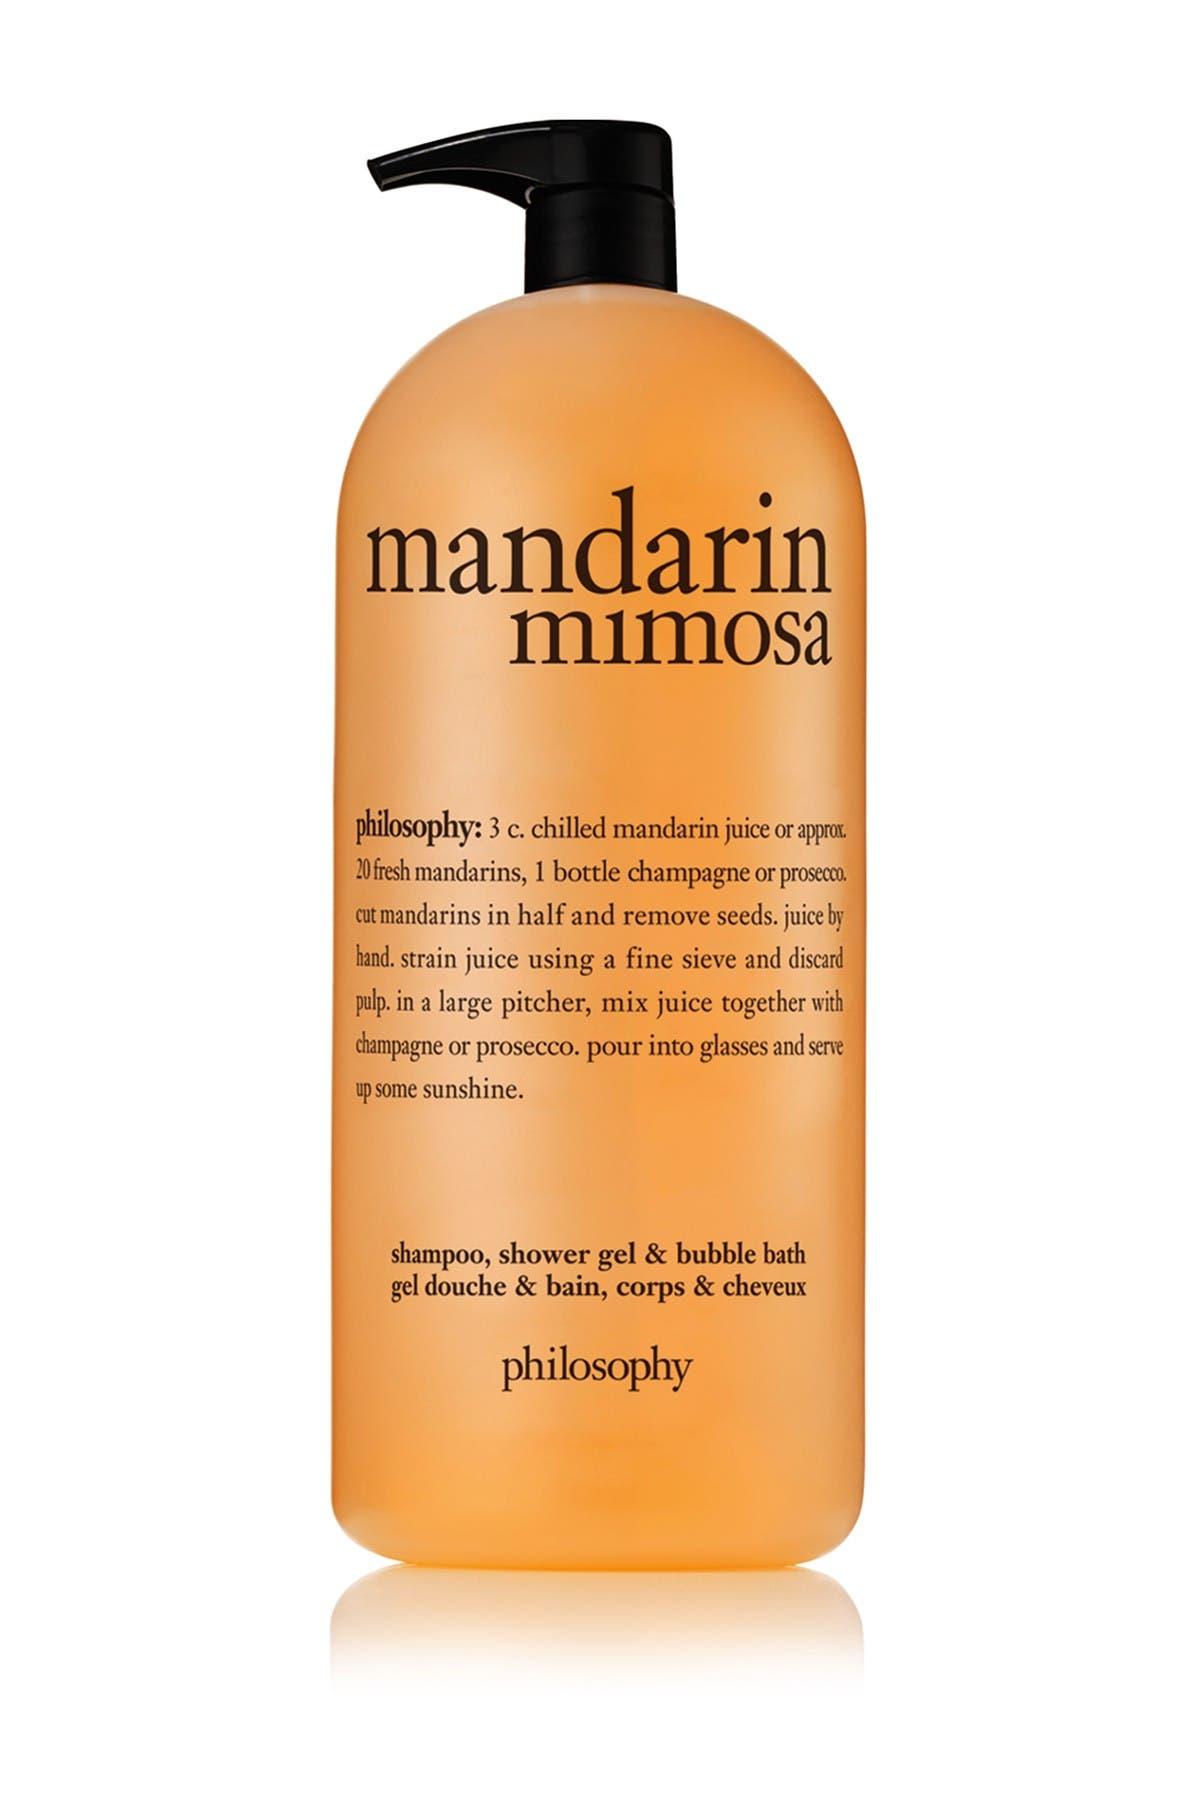 Image of philosophy Mandarin Mimosa Shower Gel - 64oz